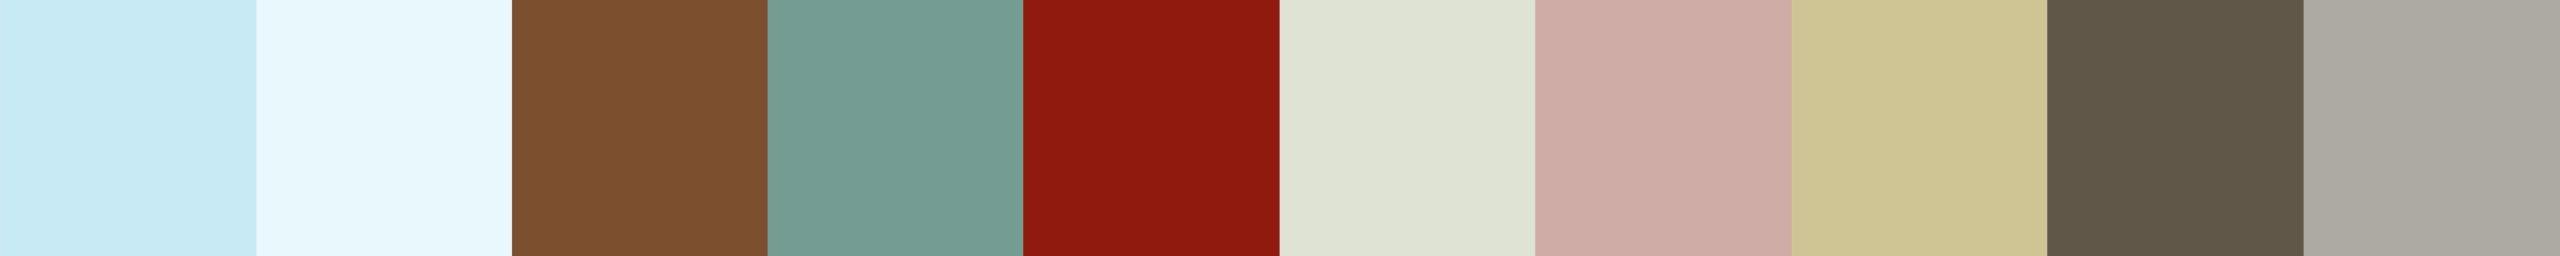 743 Jernita Color Palette